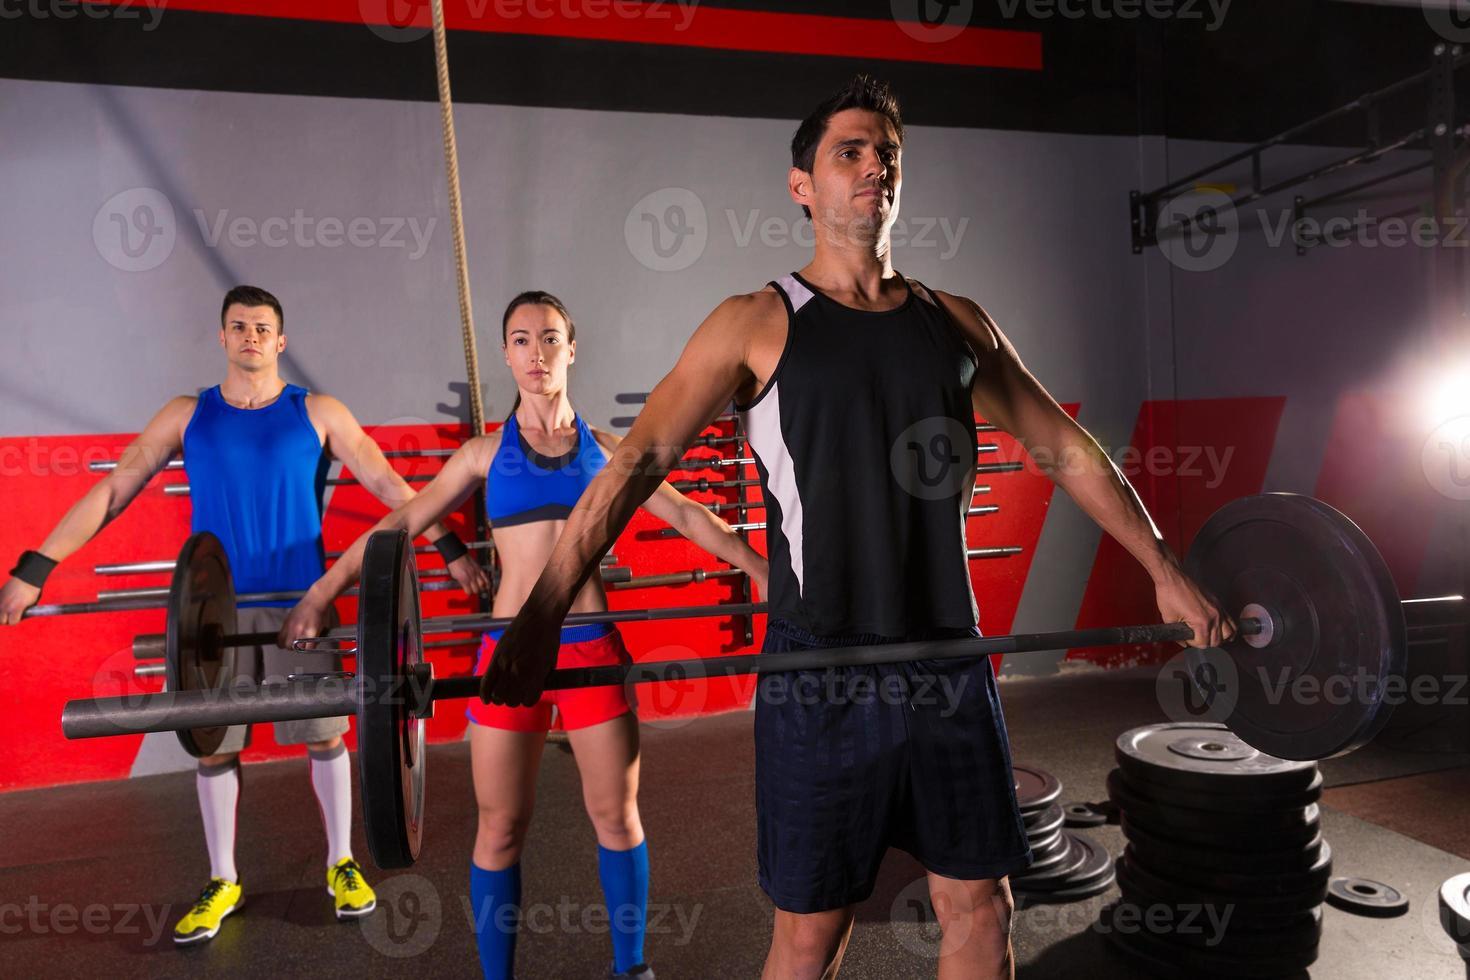 skivstång viktlyft grupp träning gym foto